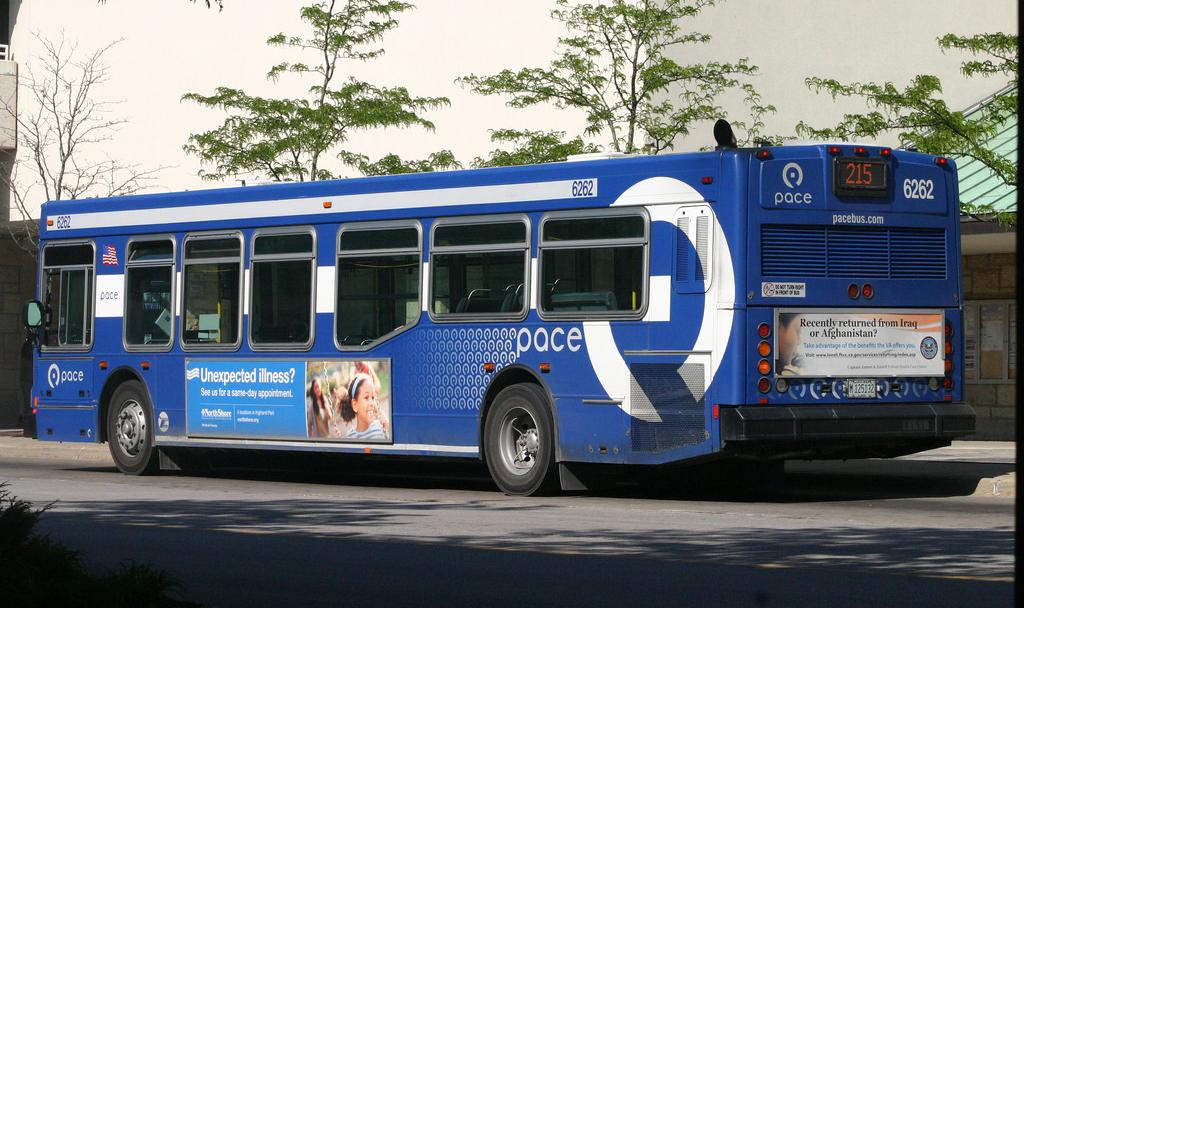 Test B Pace Suburban Bus Service